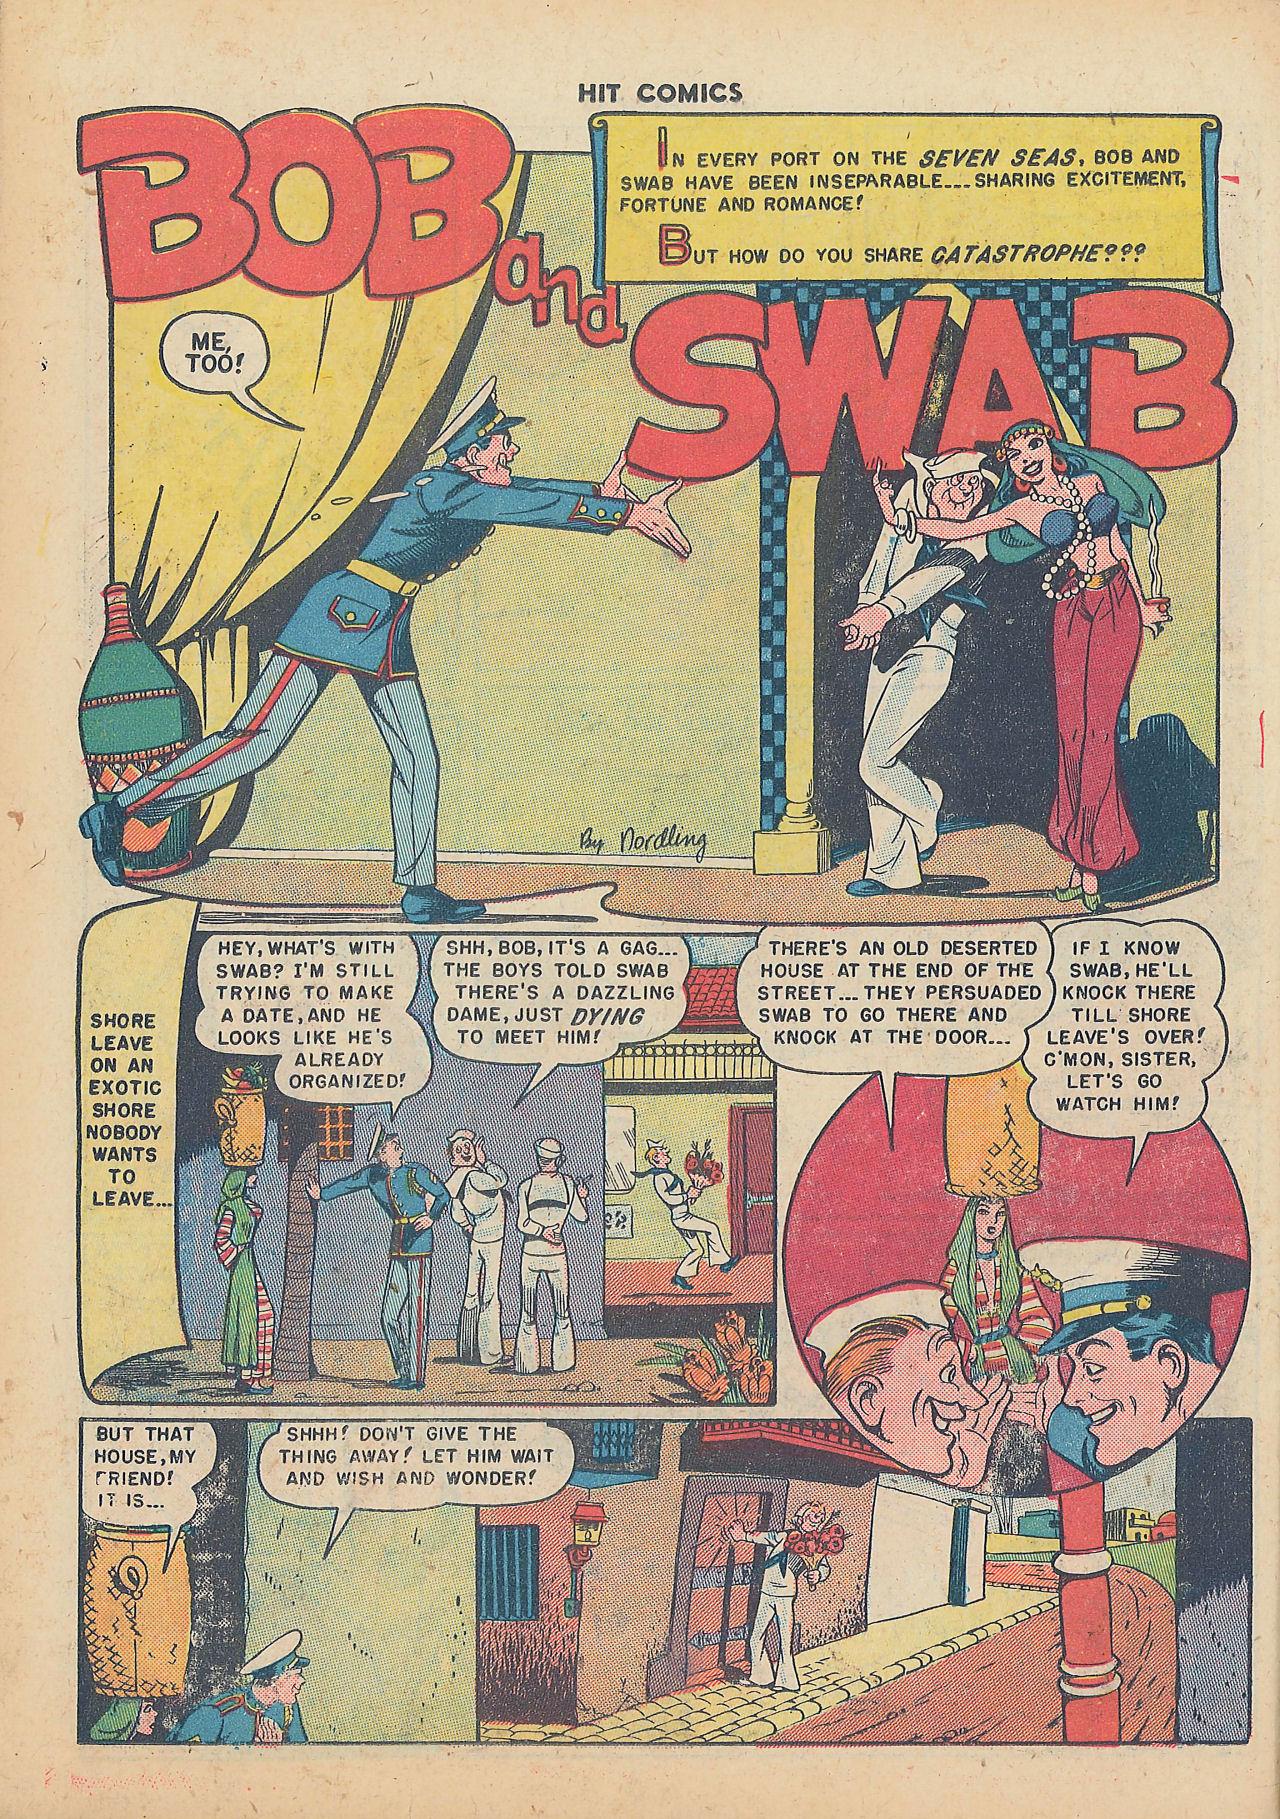 Read online Hit Comics comic -  Issue #64 - 22